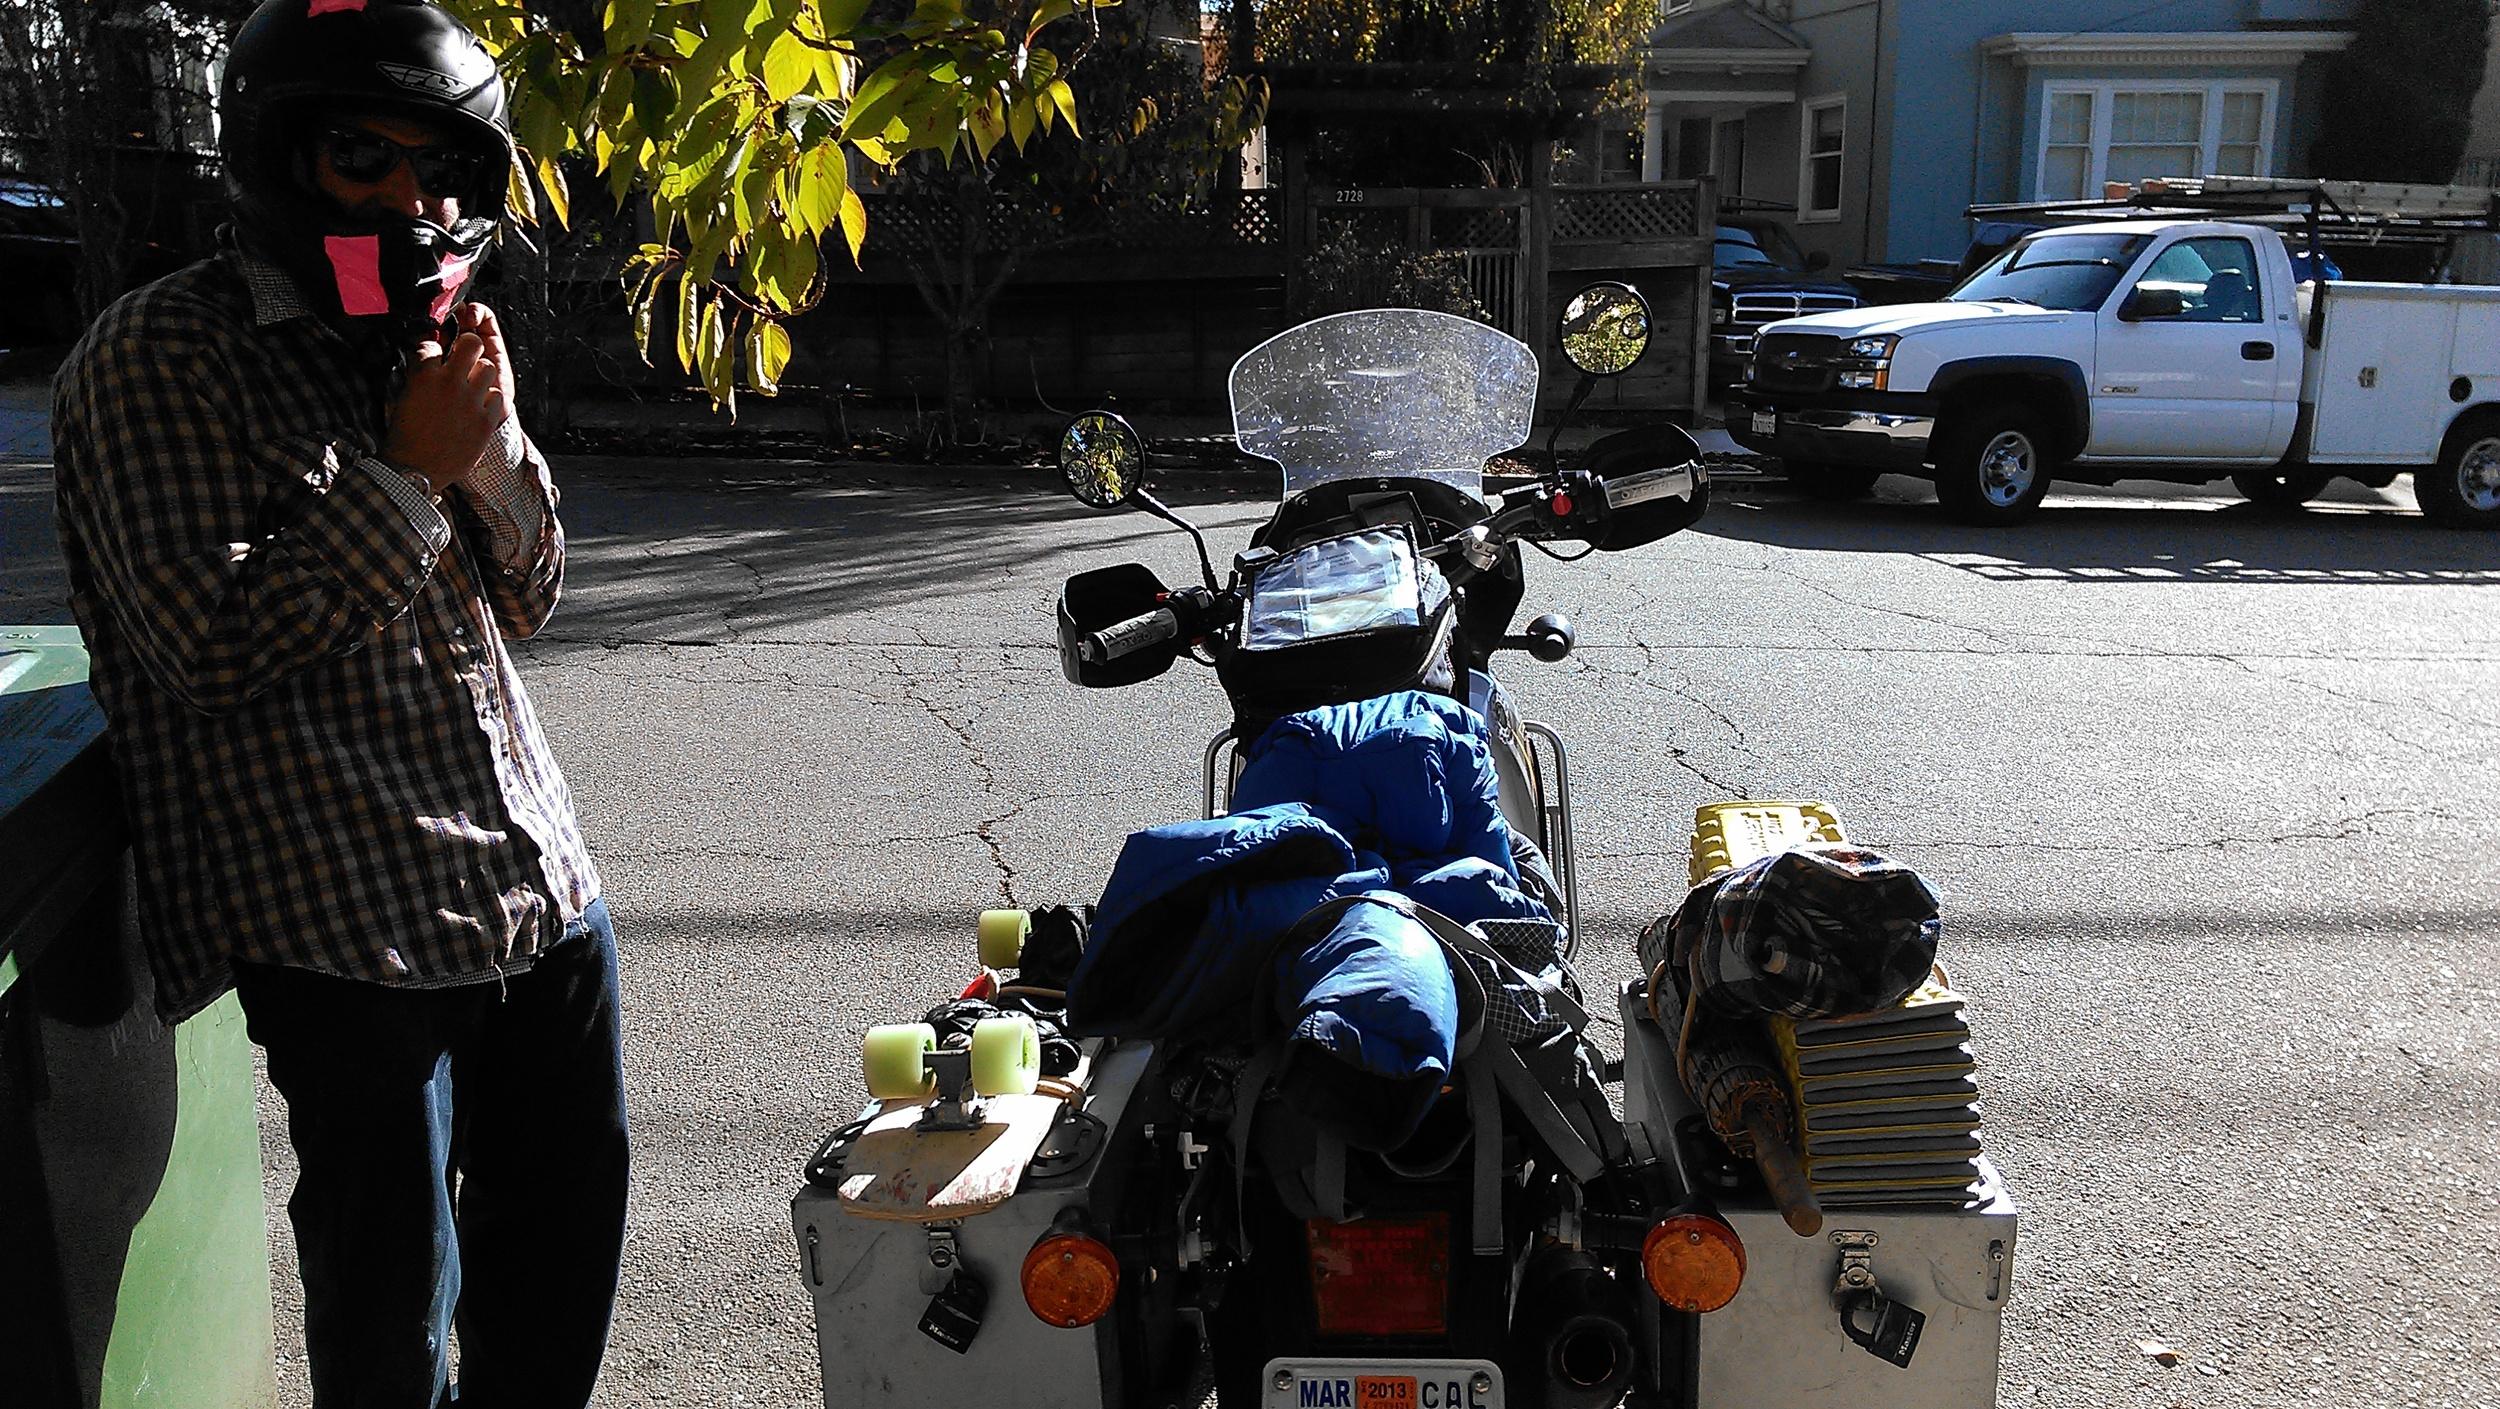 Magic Backpack on two wheels